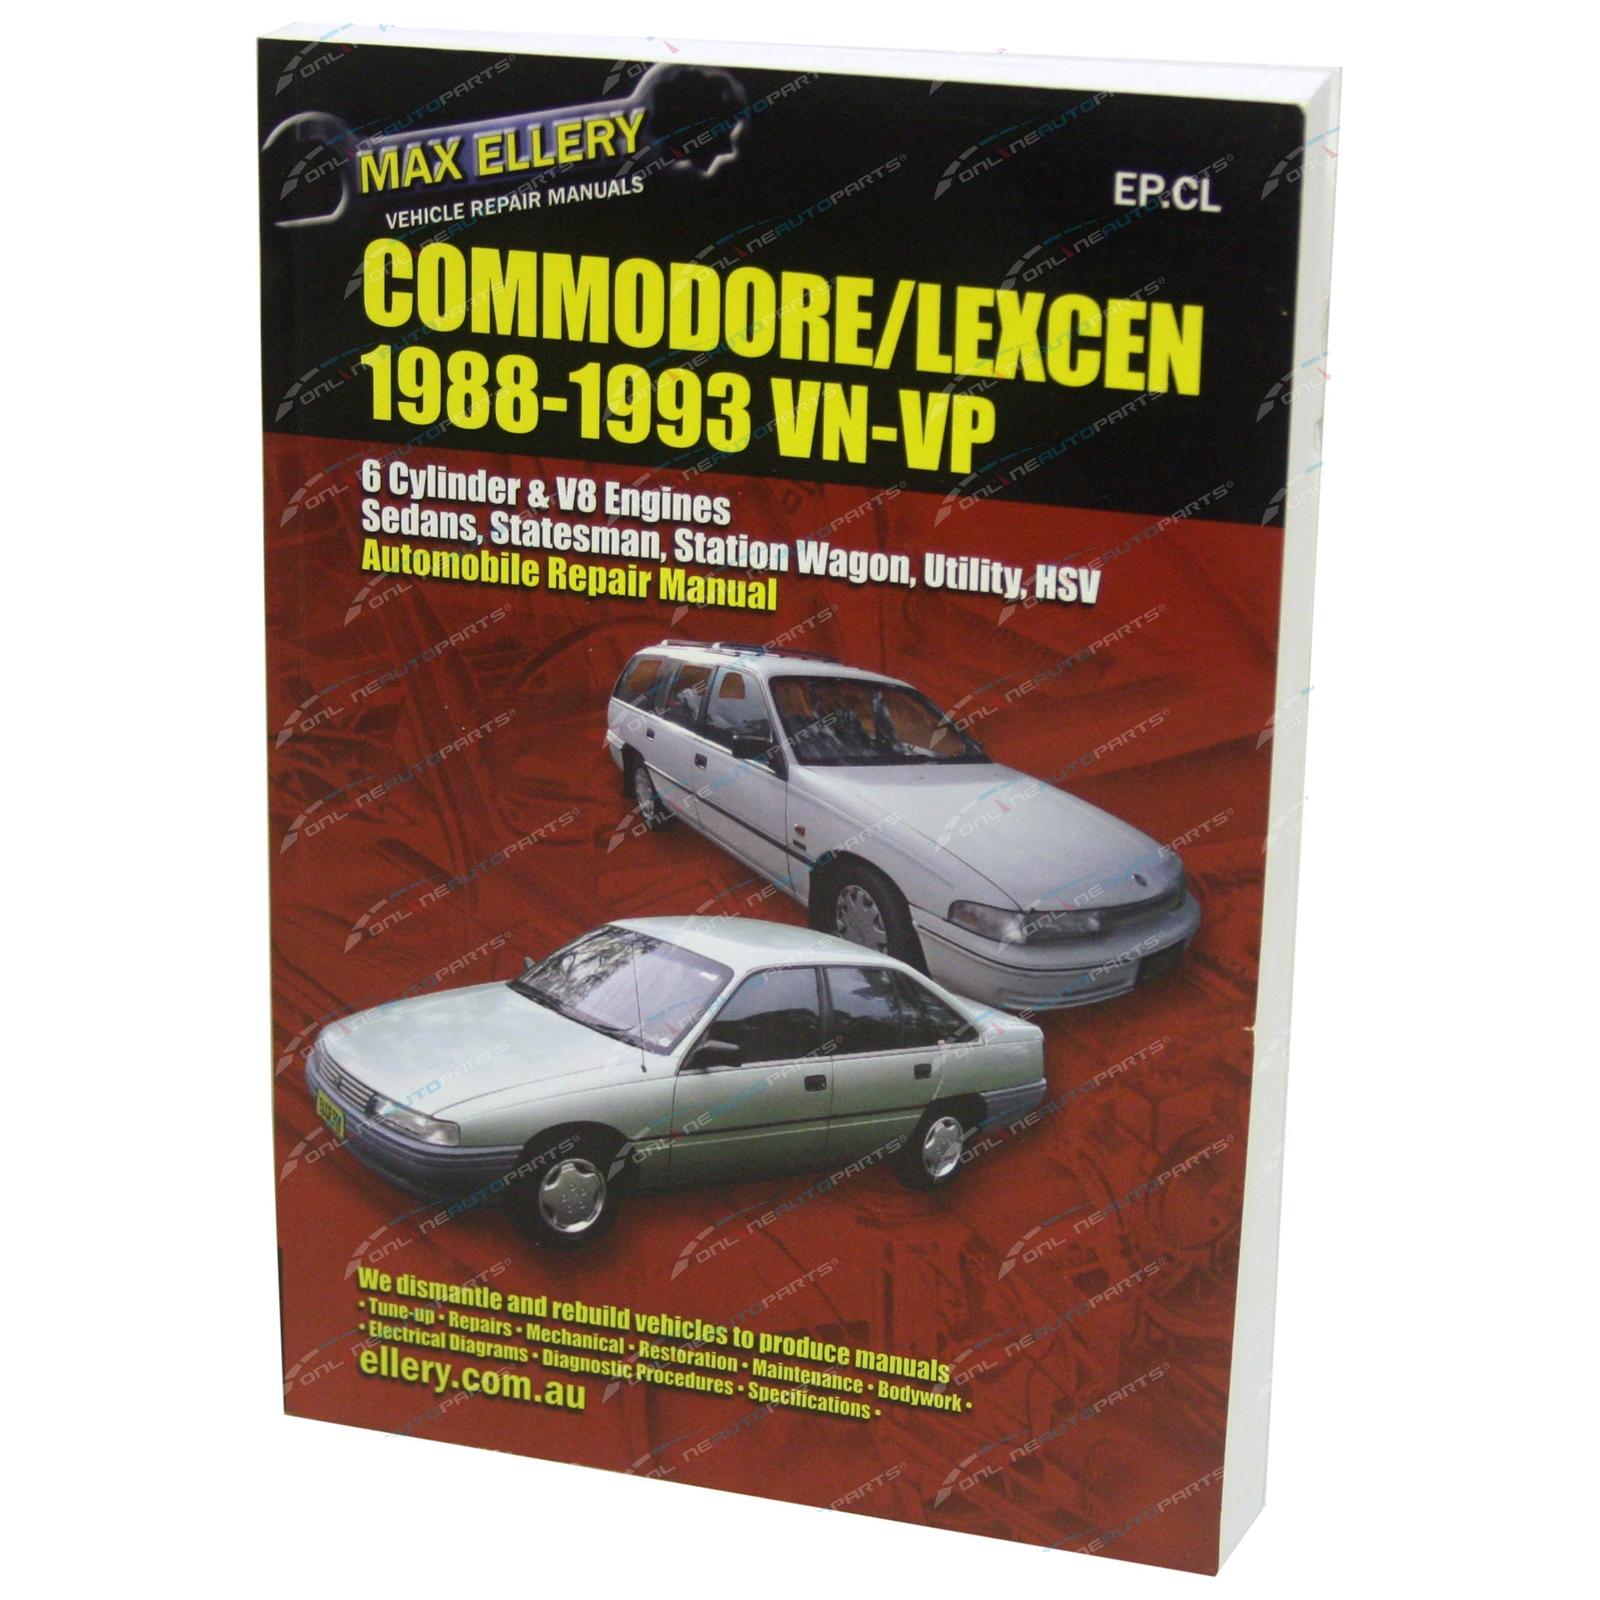 New Workshop Repair Manual Commodore Vn Vp V6 V8 456page Book Wiring Diagram Garage Service Max Ellery